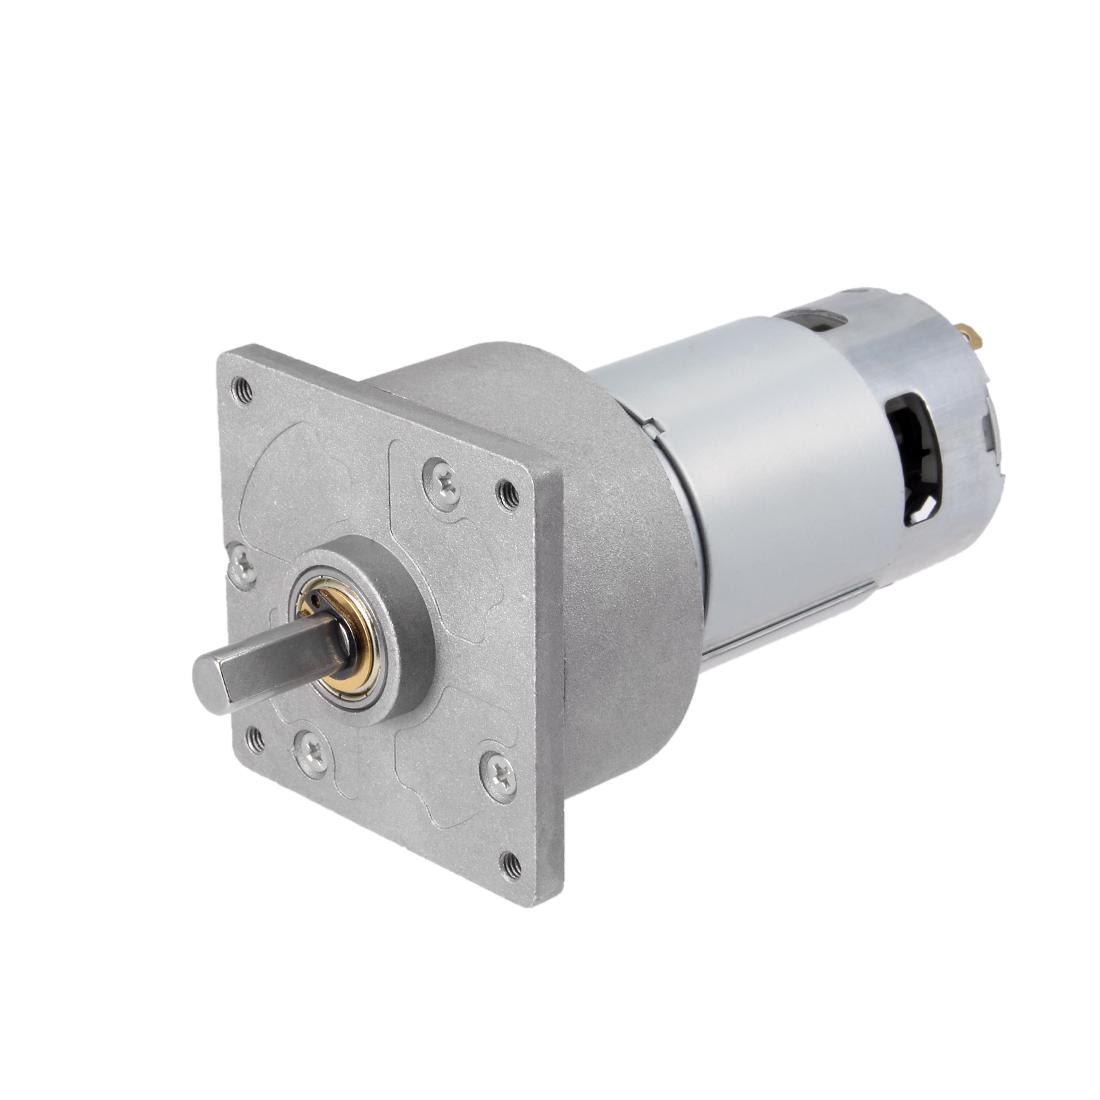 12V DC 150 RPM Gear Motor High Torque Reduction Gearbox Centric Output D Shaft